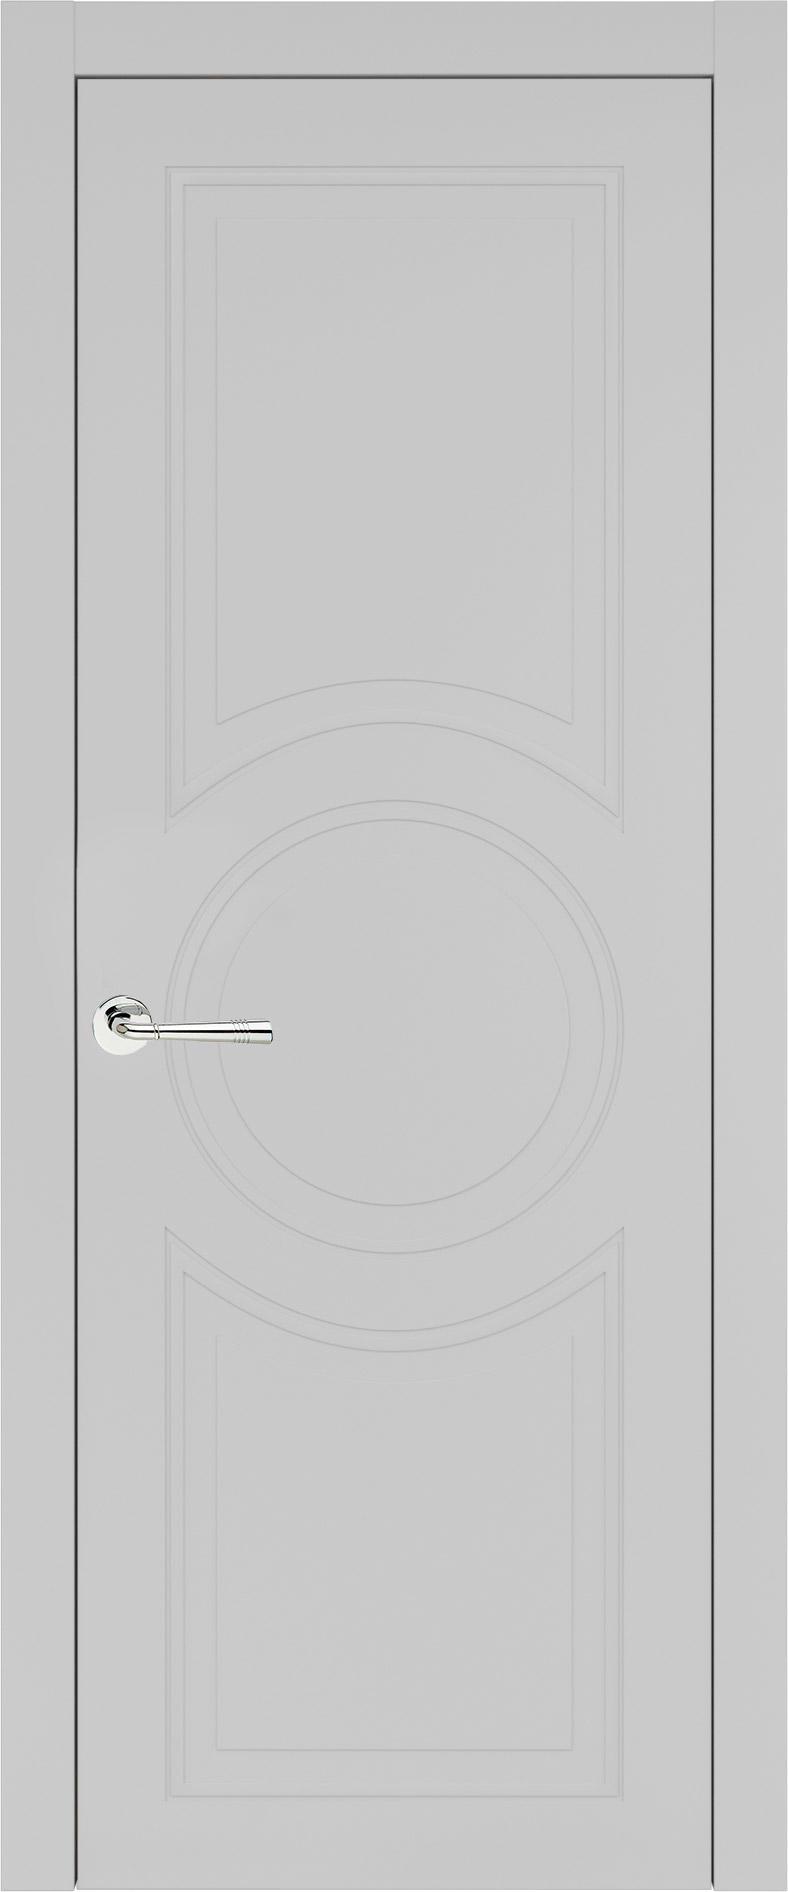 Ravenna Neo Classic цвет - Серая эмаль (RAL 7047) Без стекла (ДГ)